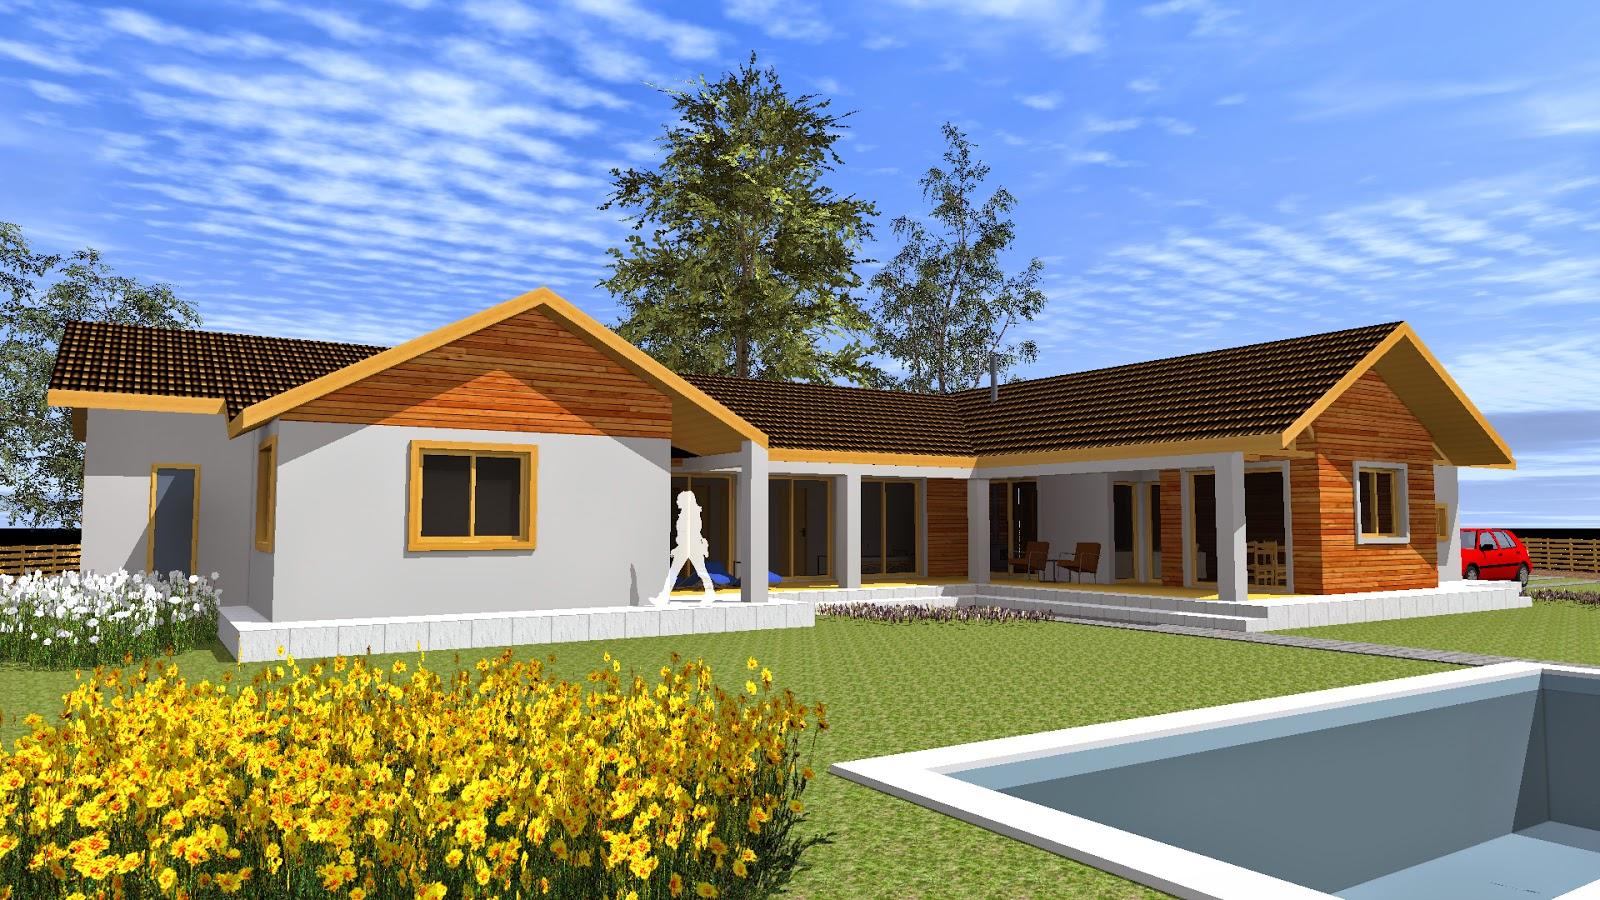 Casa de campo 200 m2 arquitecto cristian estrada massera rancagua pichilemu machali olivar - Casas de campo embargadas en lorca ...